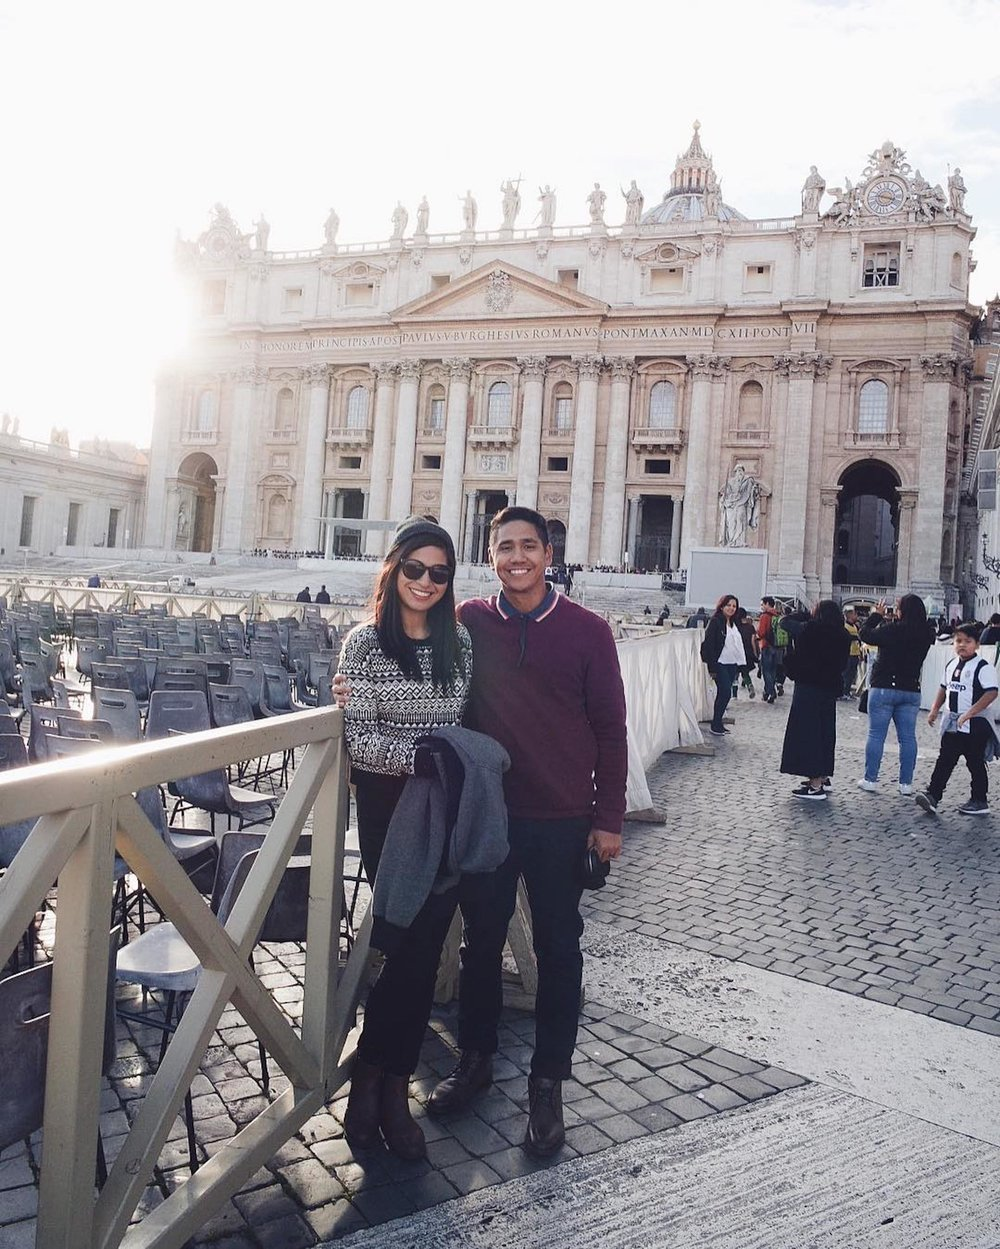 roxci-vergs-st-peter-basilica